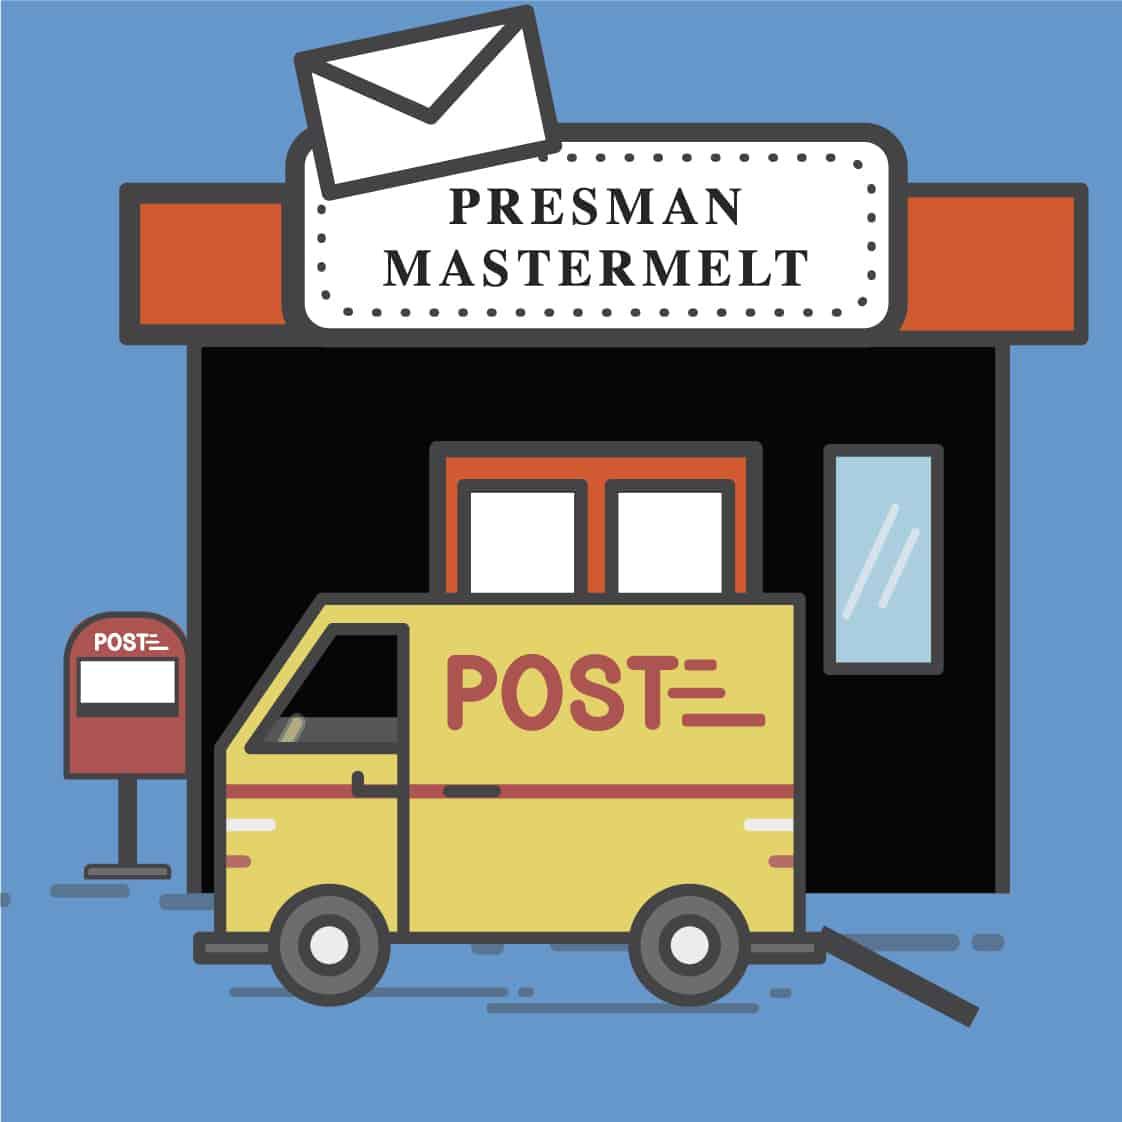 Presman Mastermelt's postal service reopens